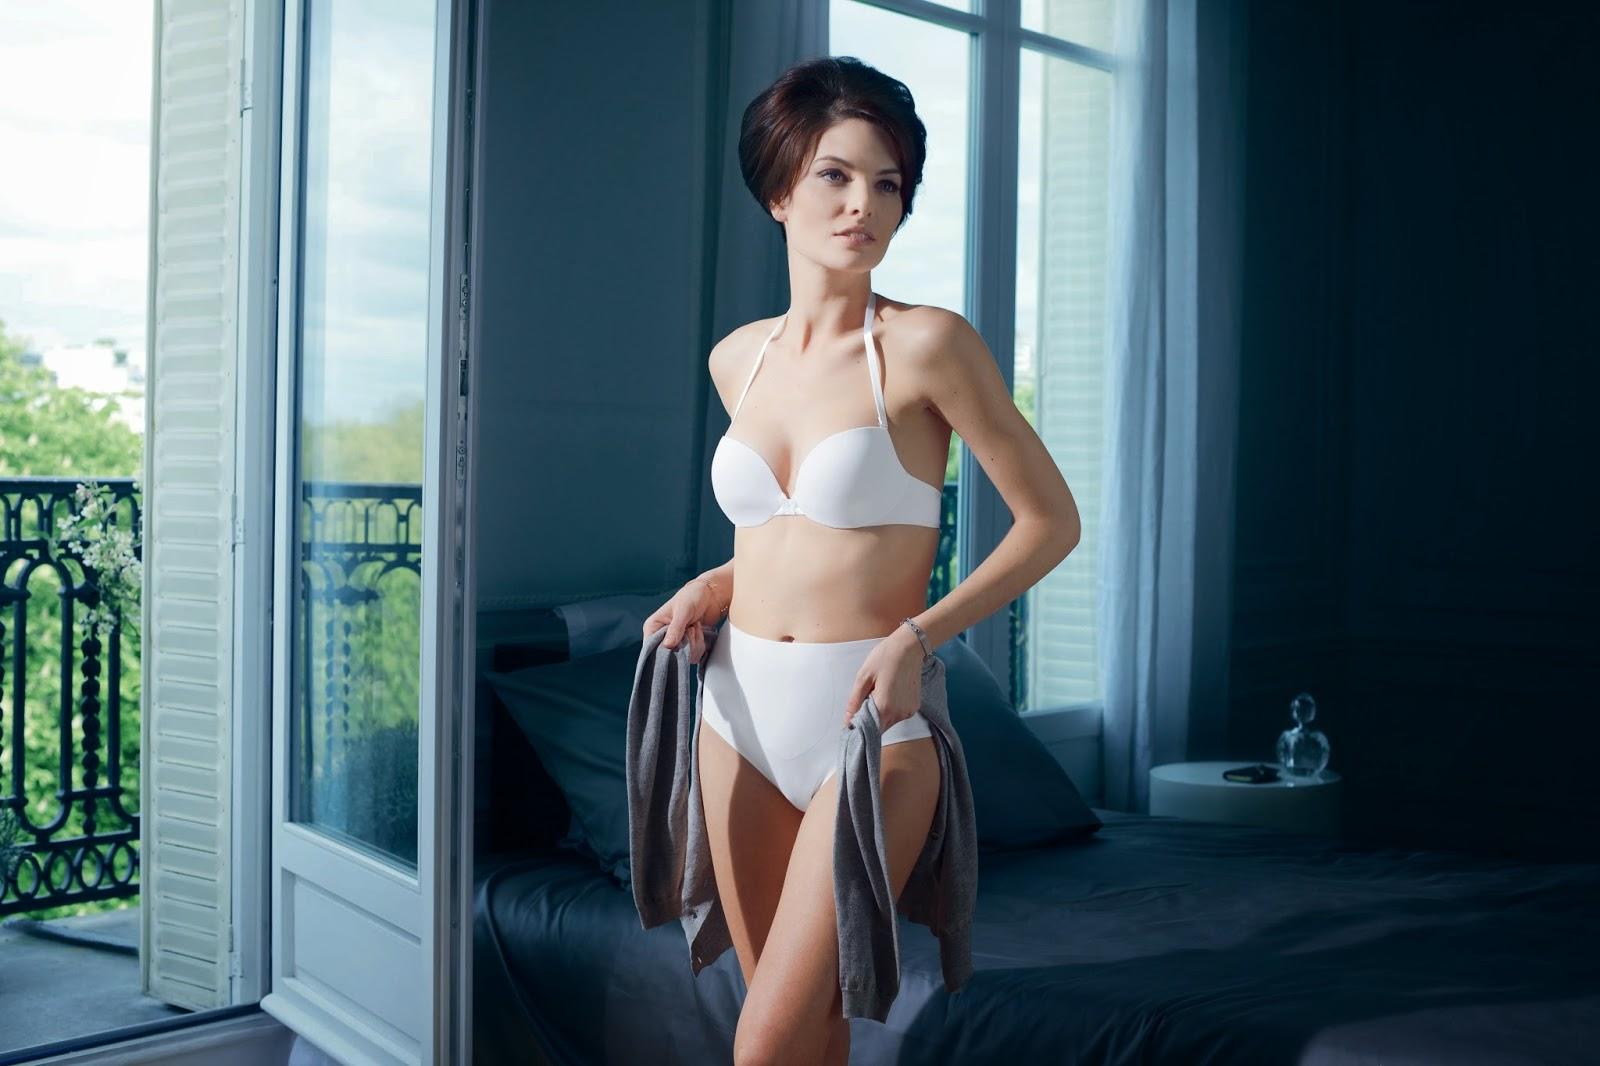 Model Photos: Marina Mozzoni